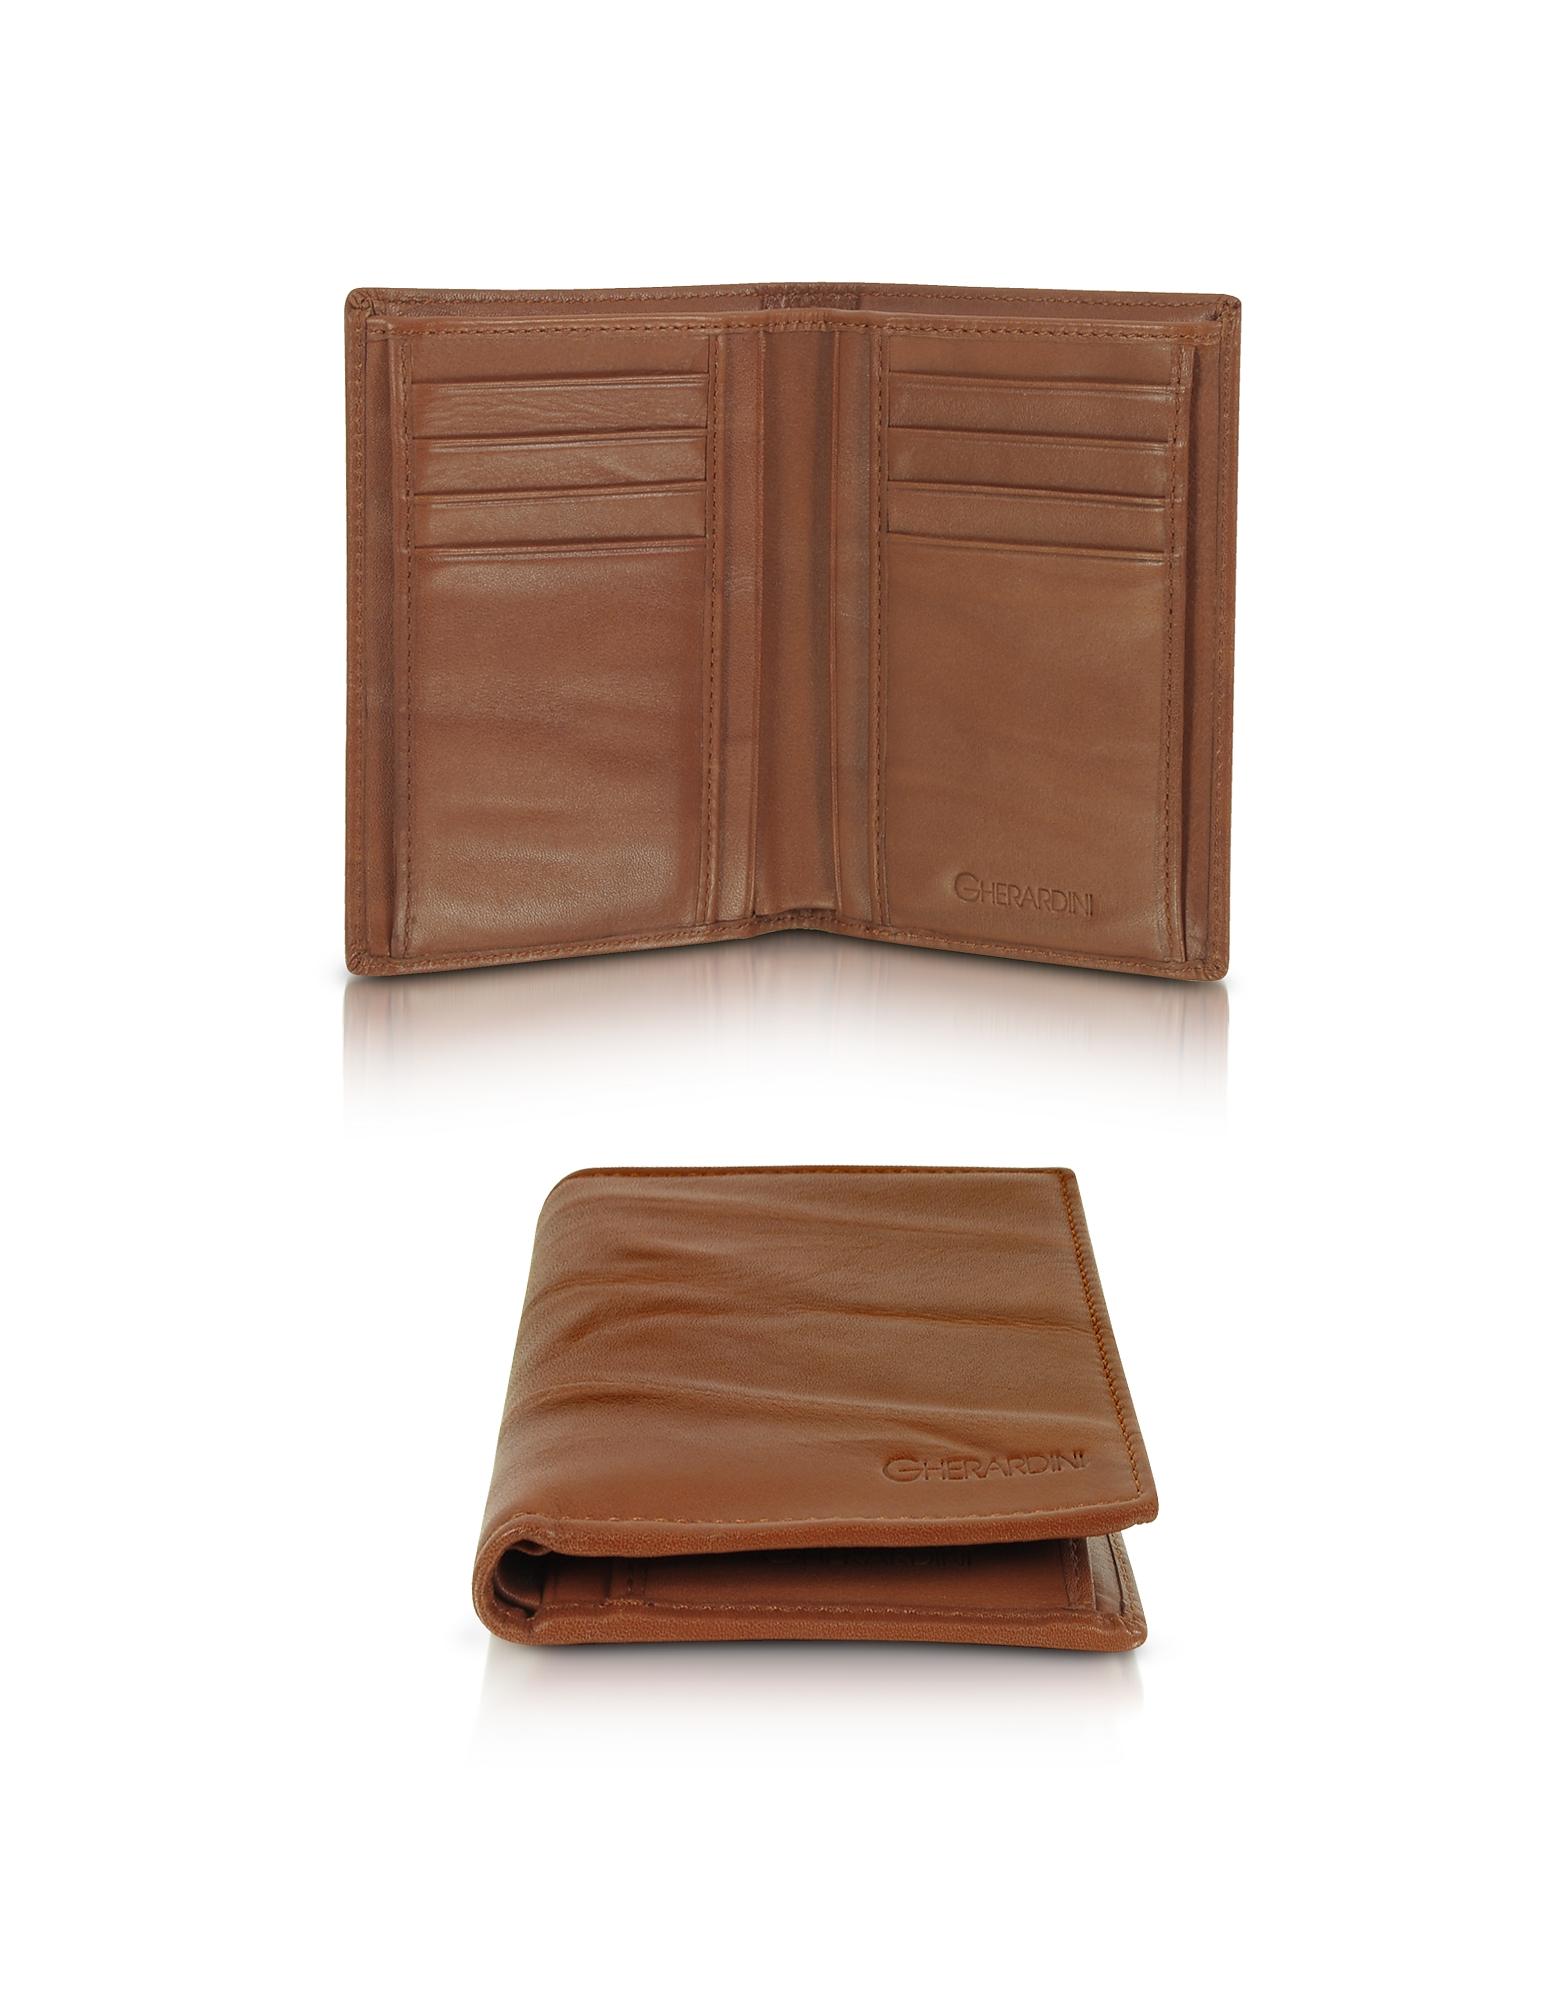 Pleated Leather Men's Vertical Wallet, Cognac